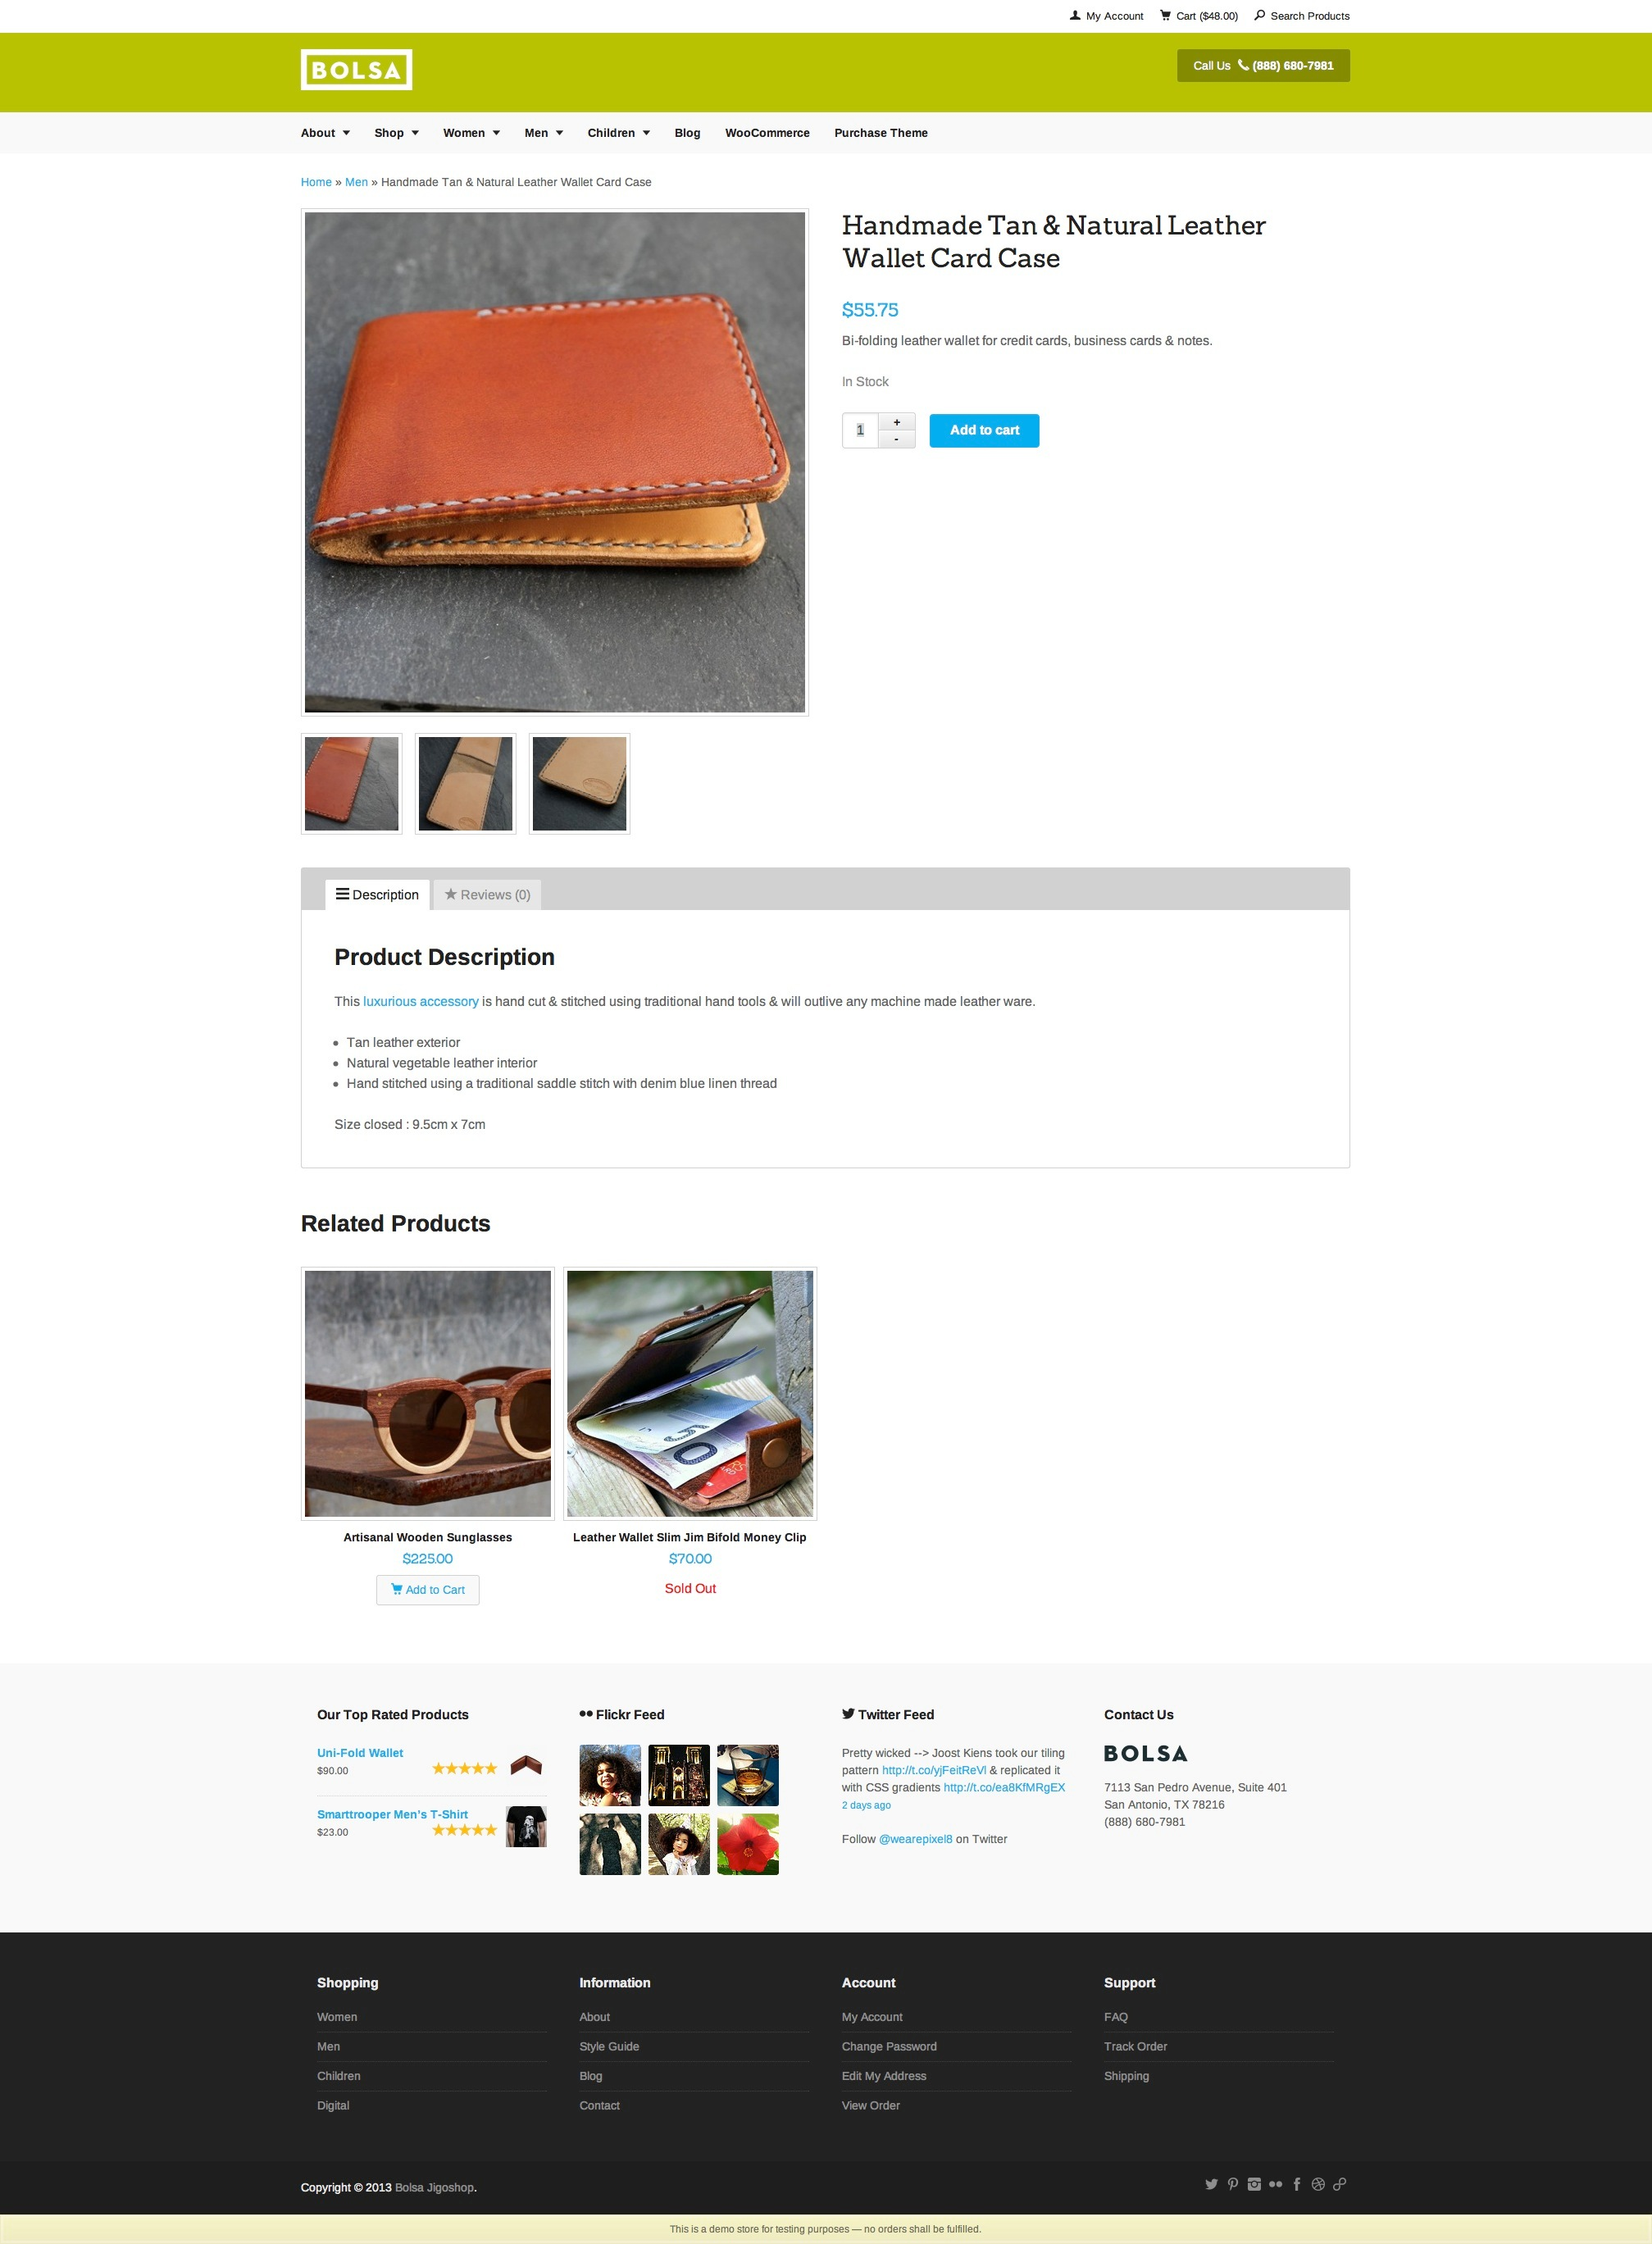 Jigoshop Product Page